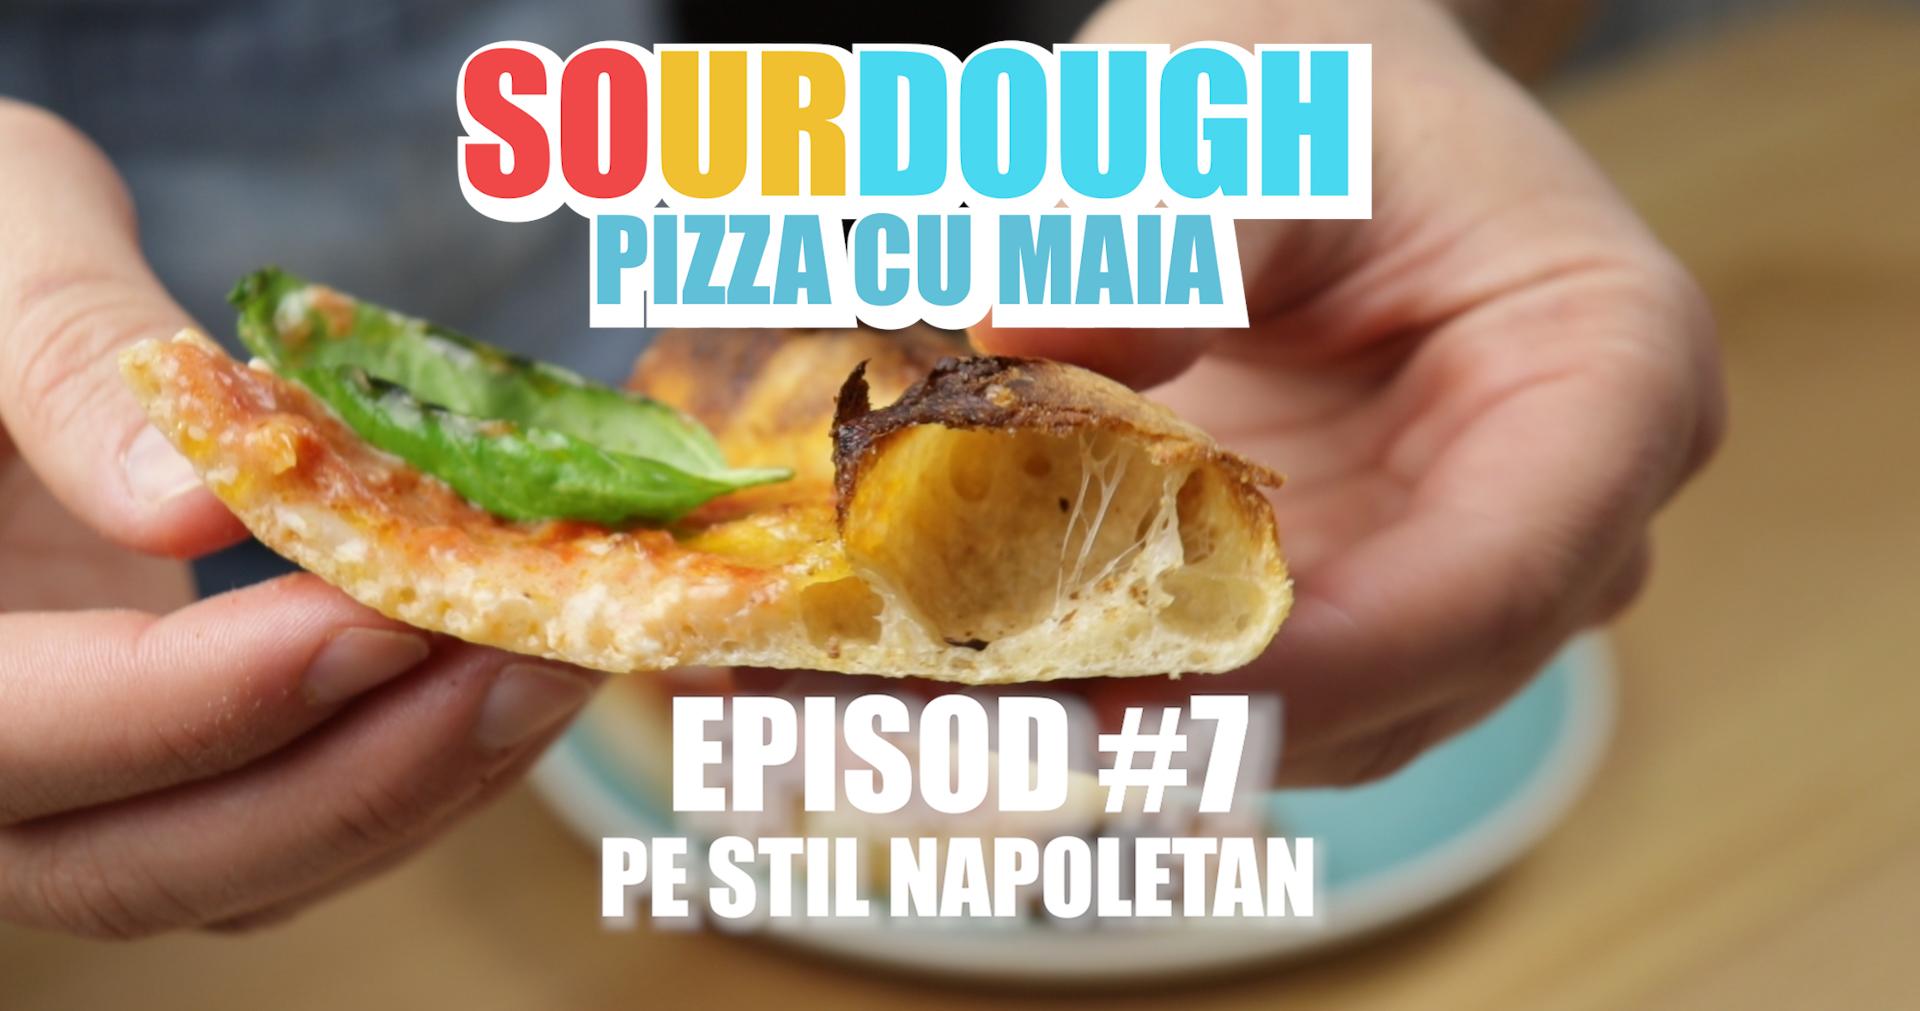 Pizza cu maia homemade, pe stil napoletan